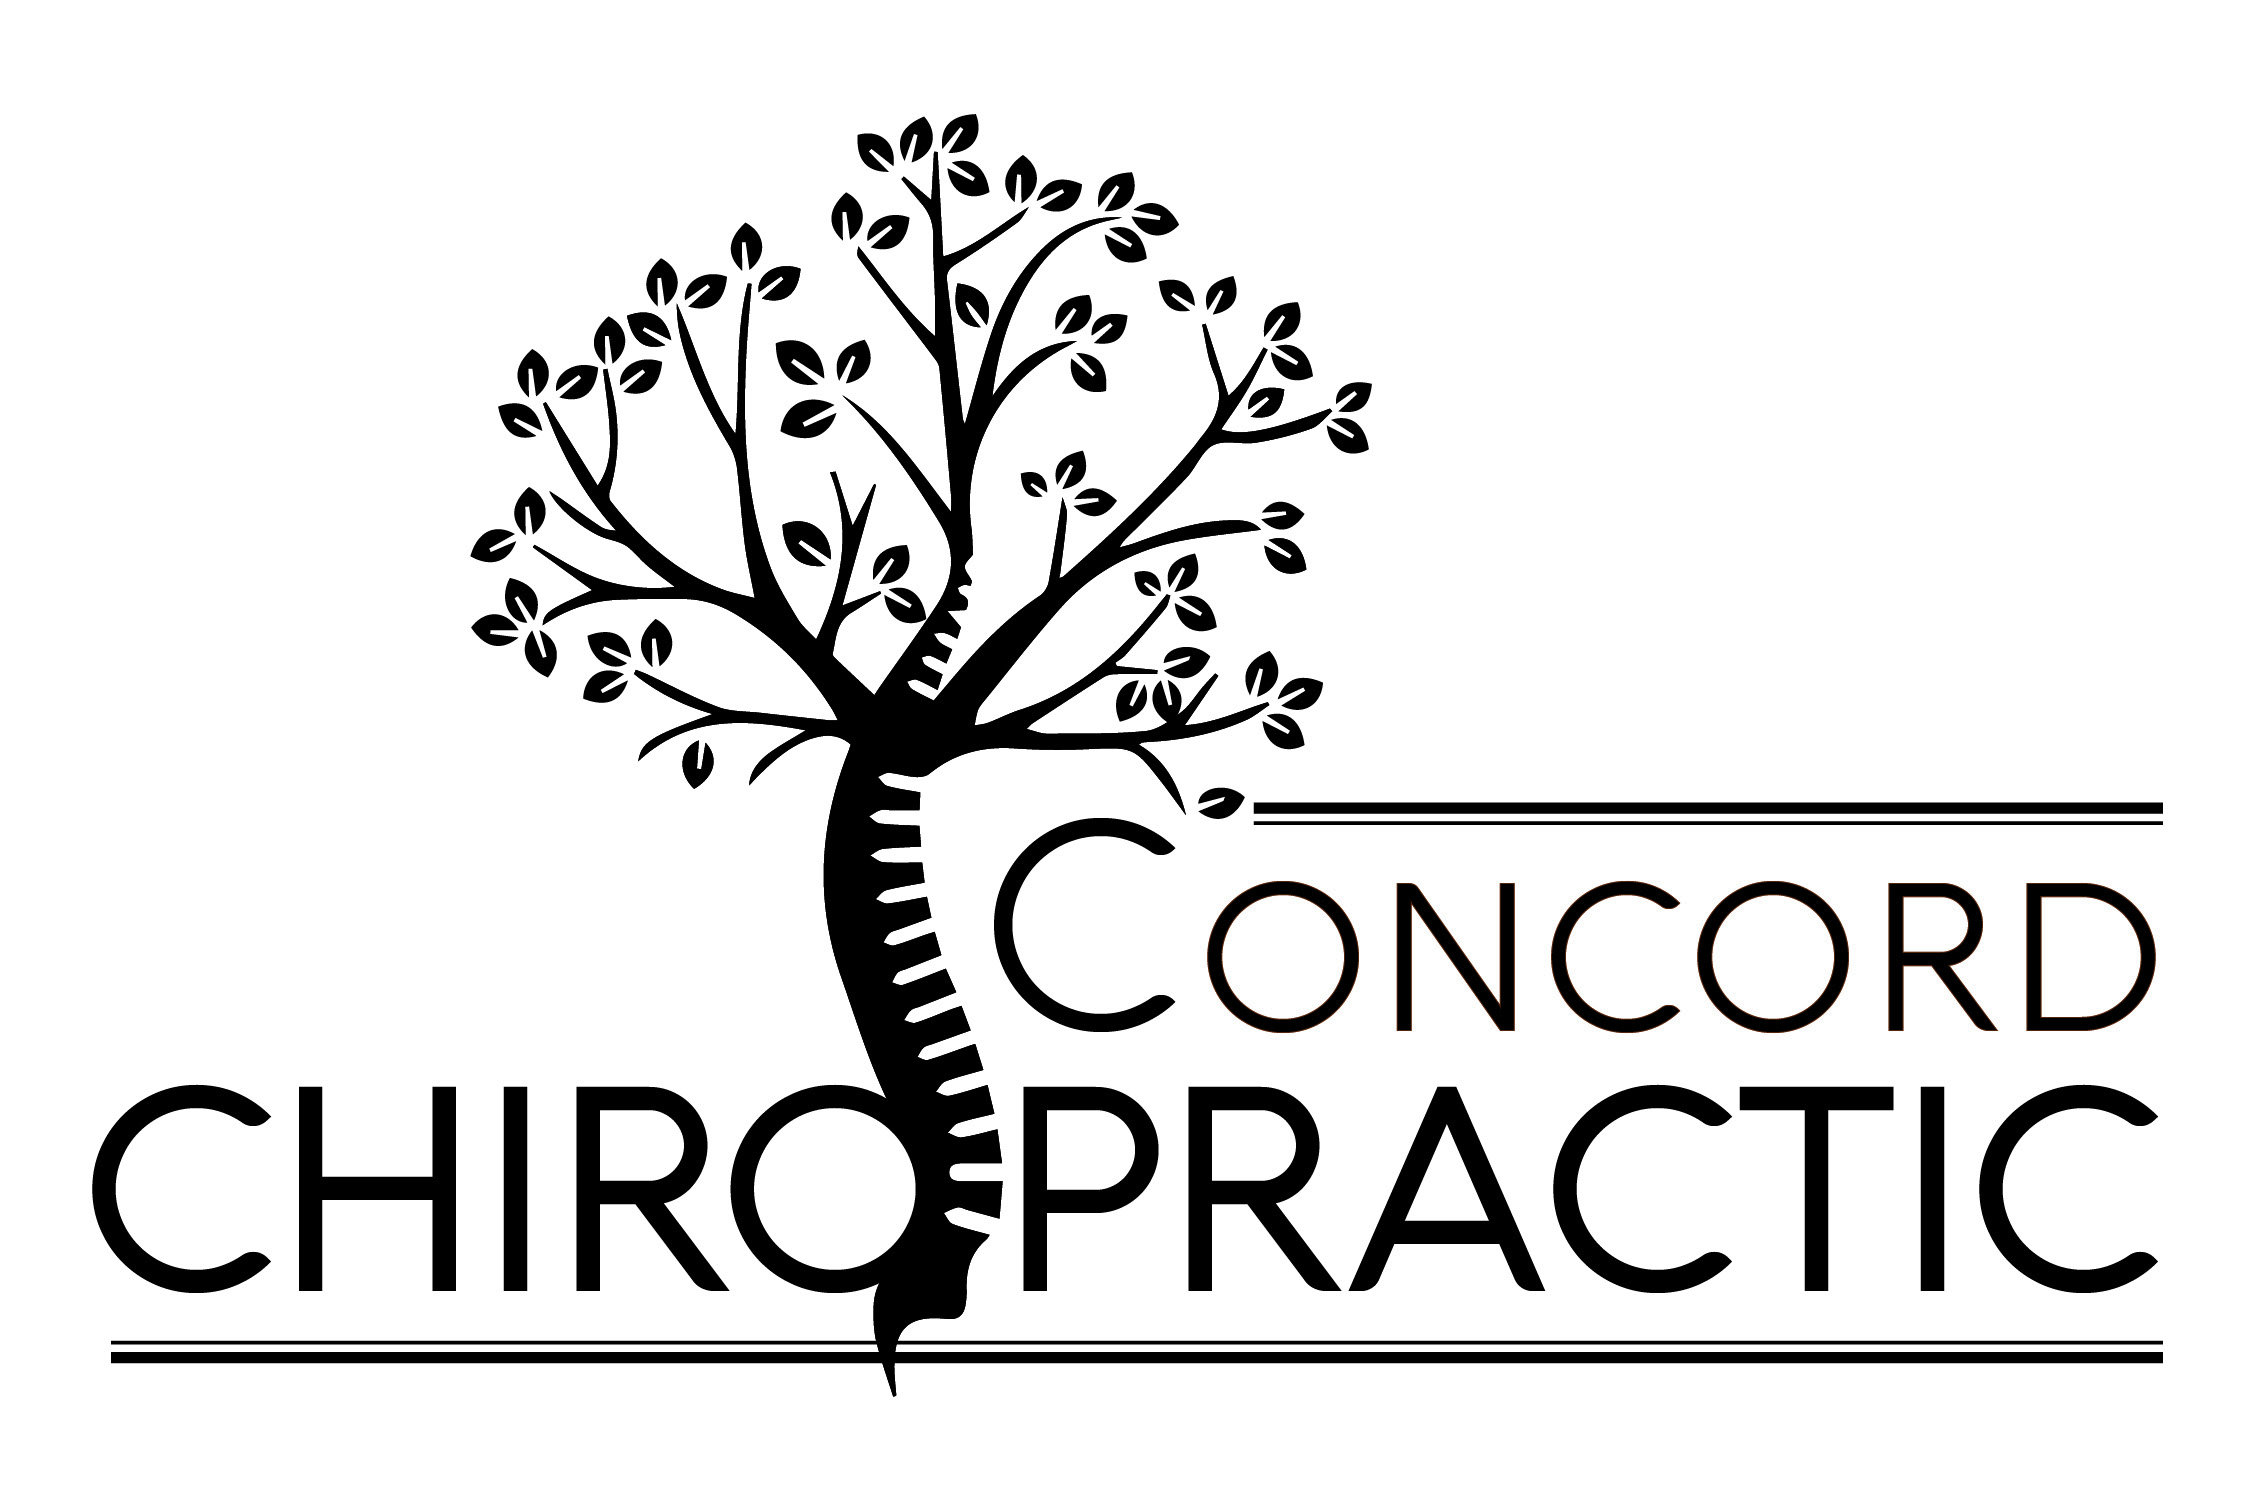 concord_chiro_logo_black.jpg